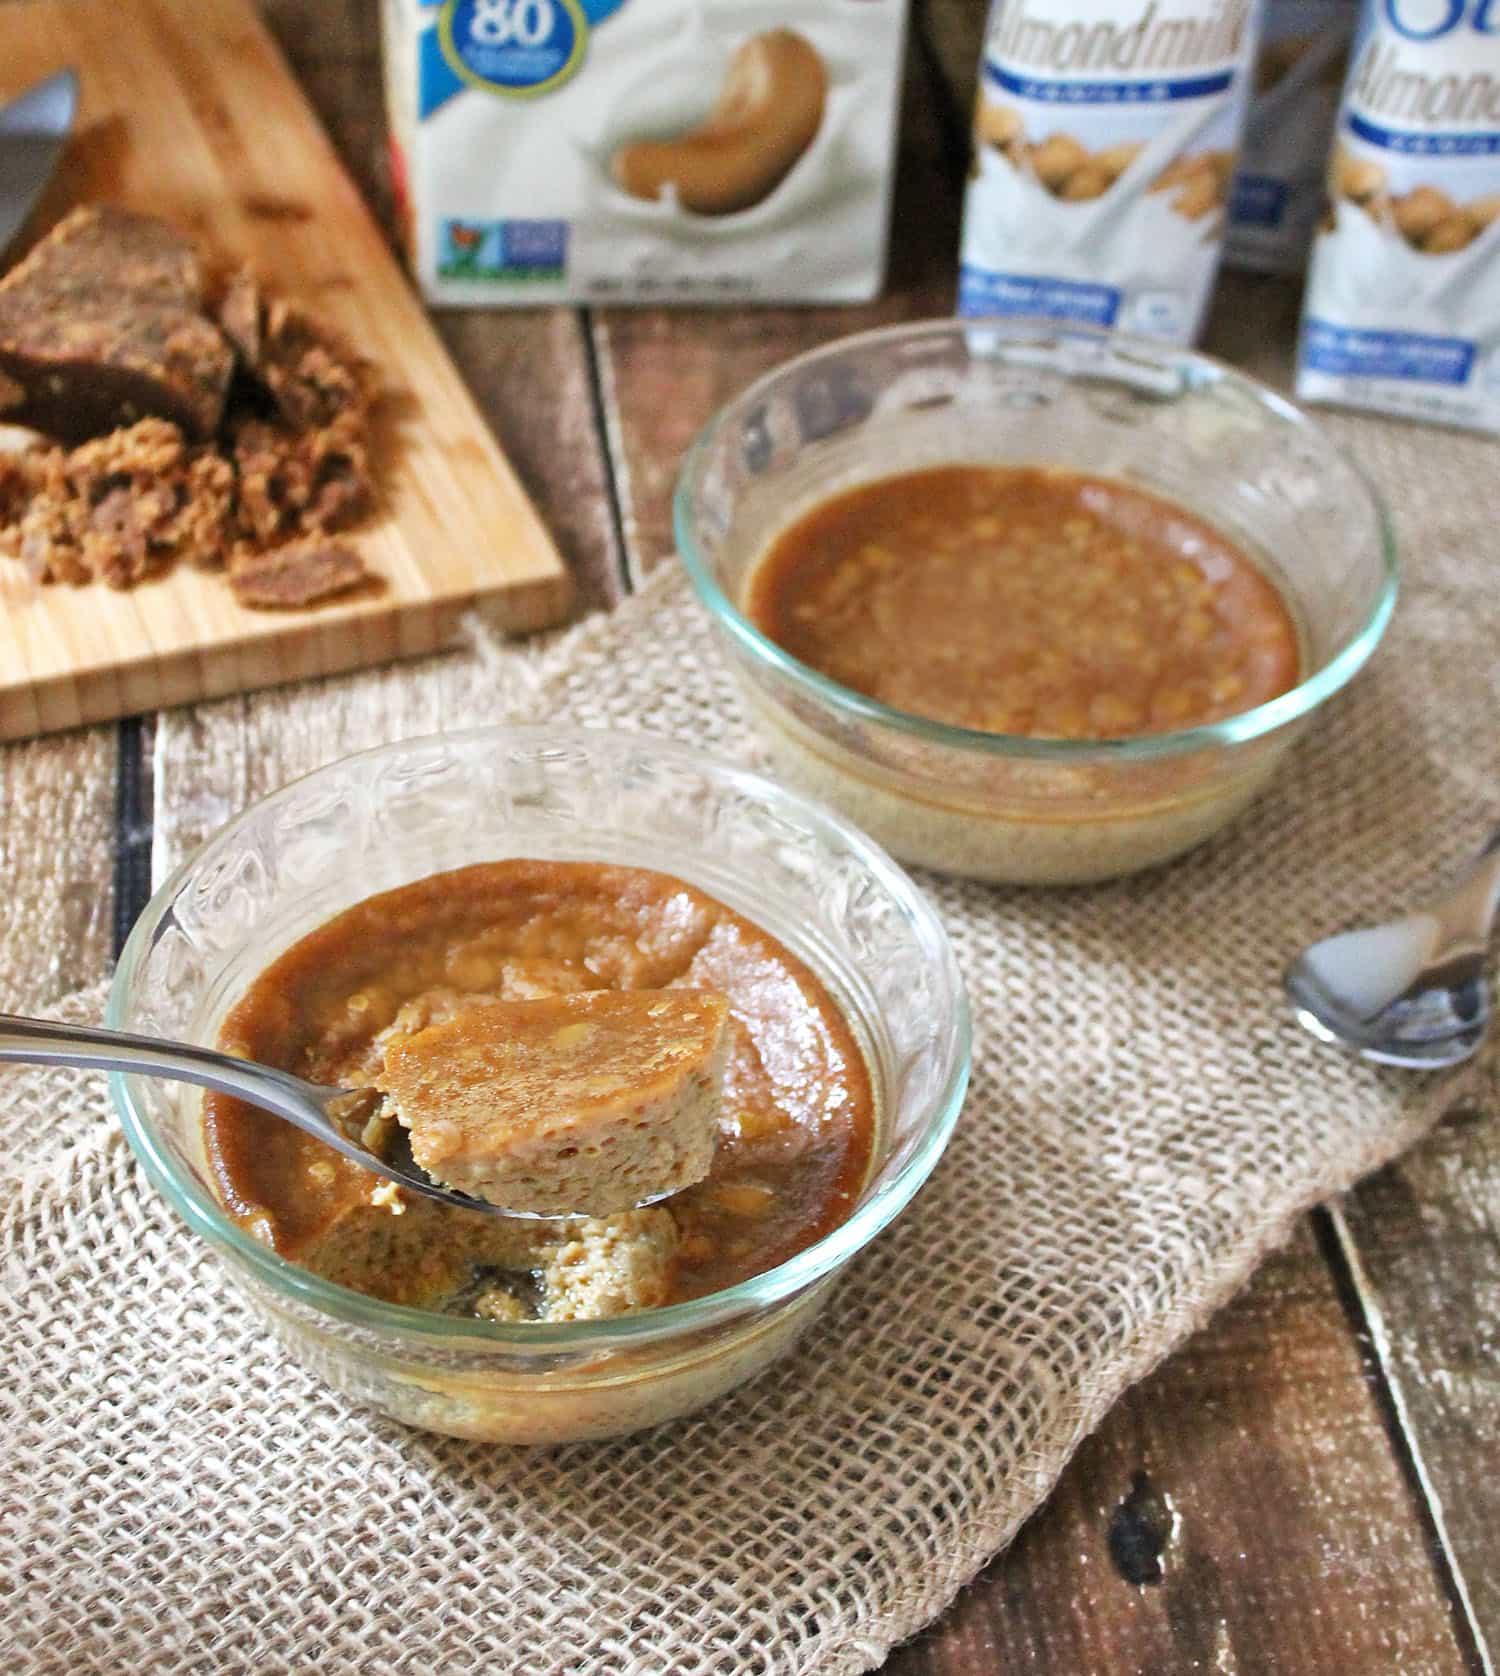 Cardamom Spiced Custard